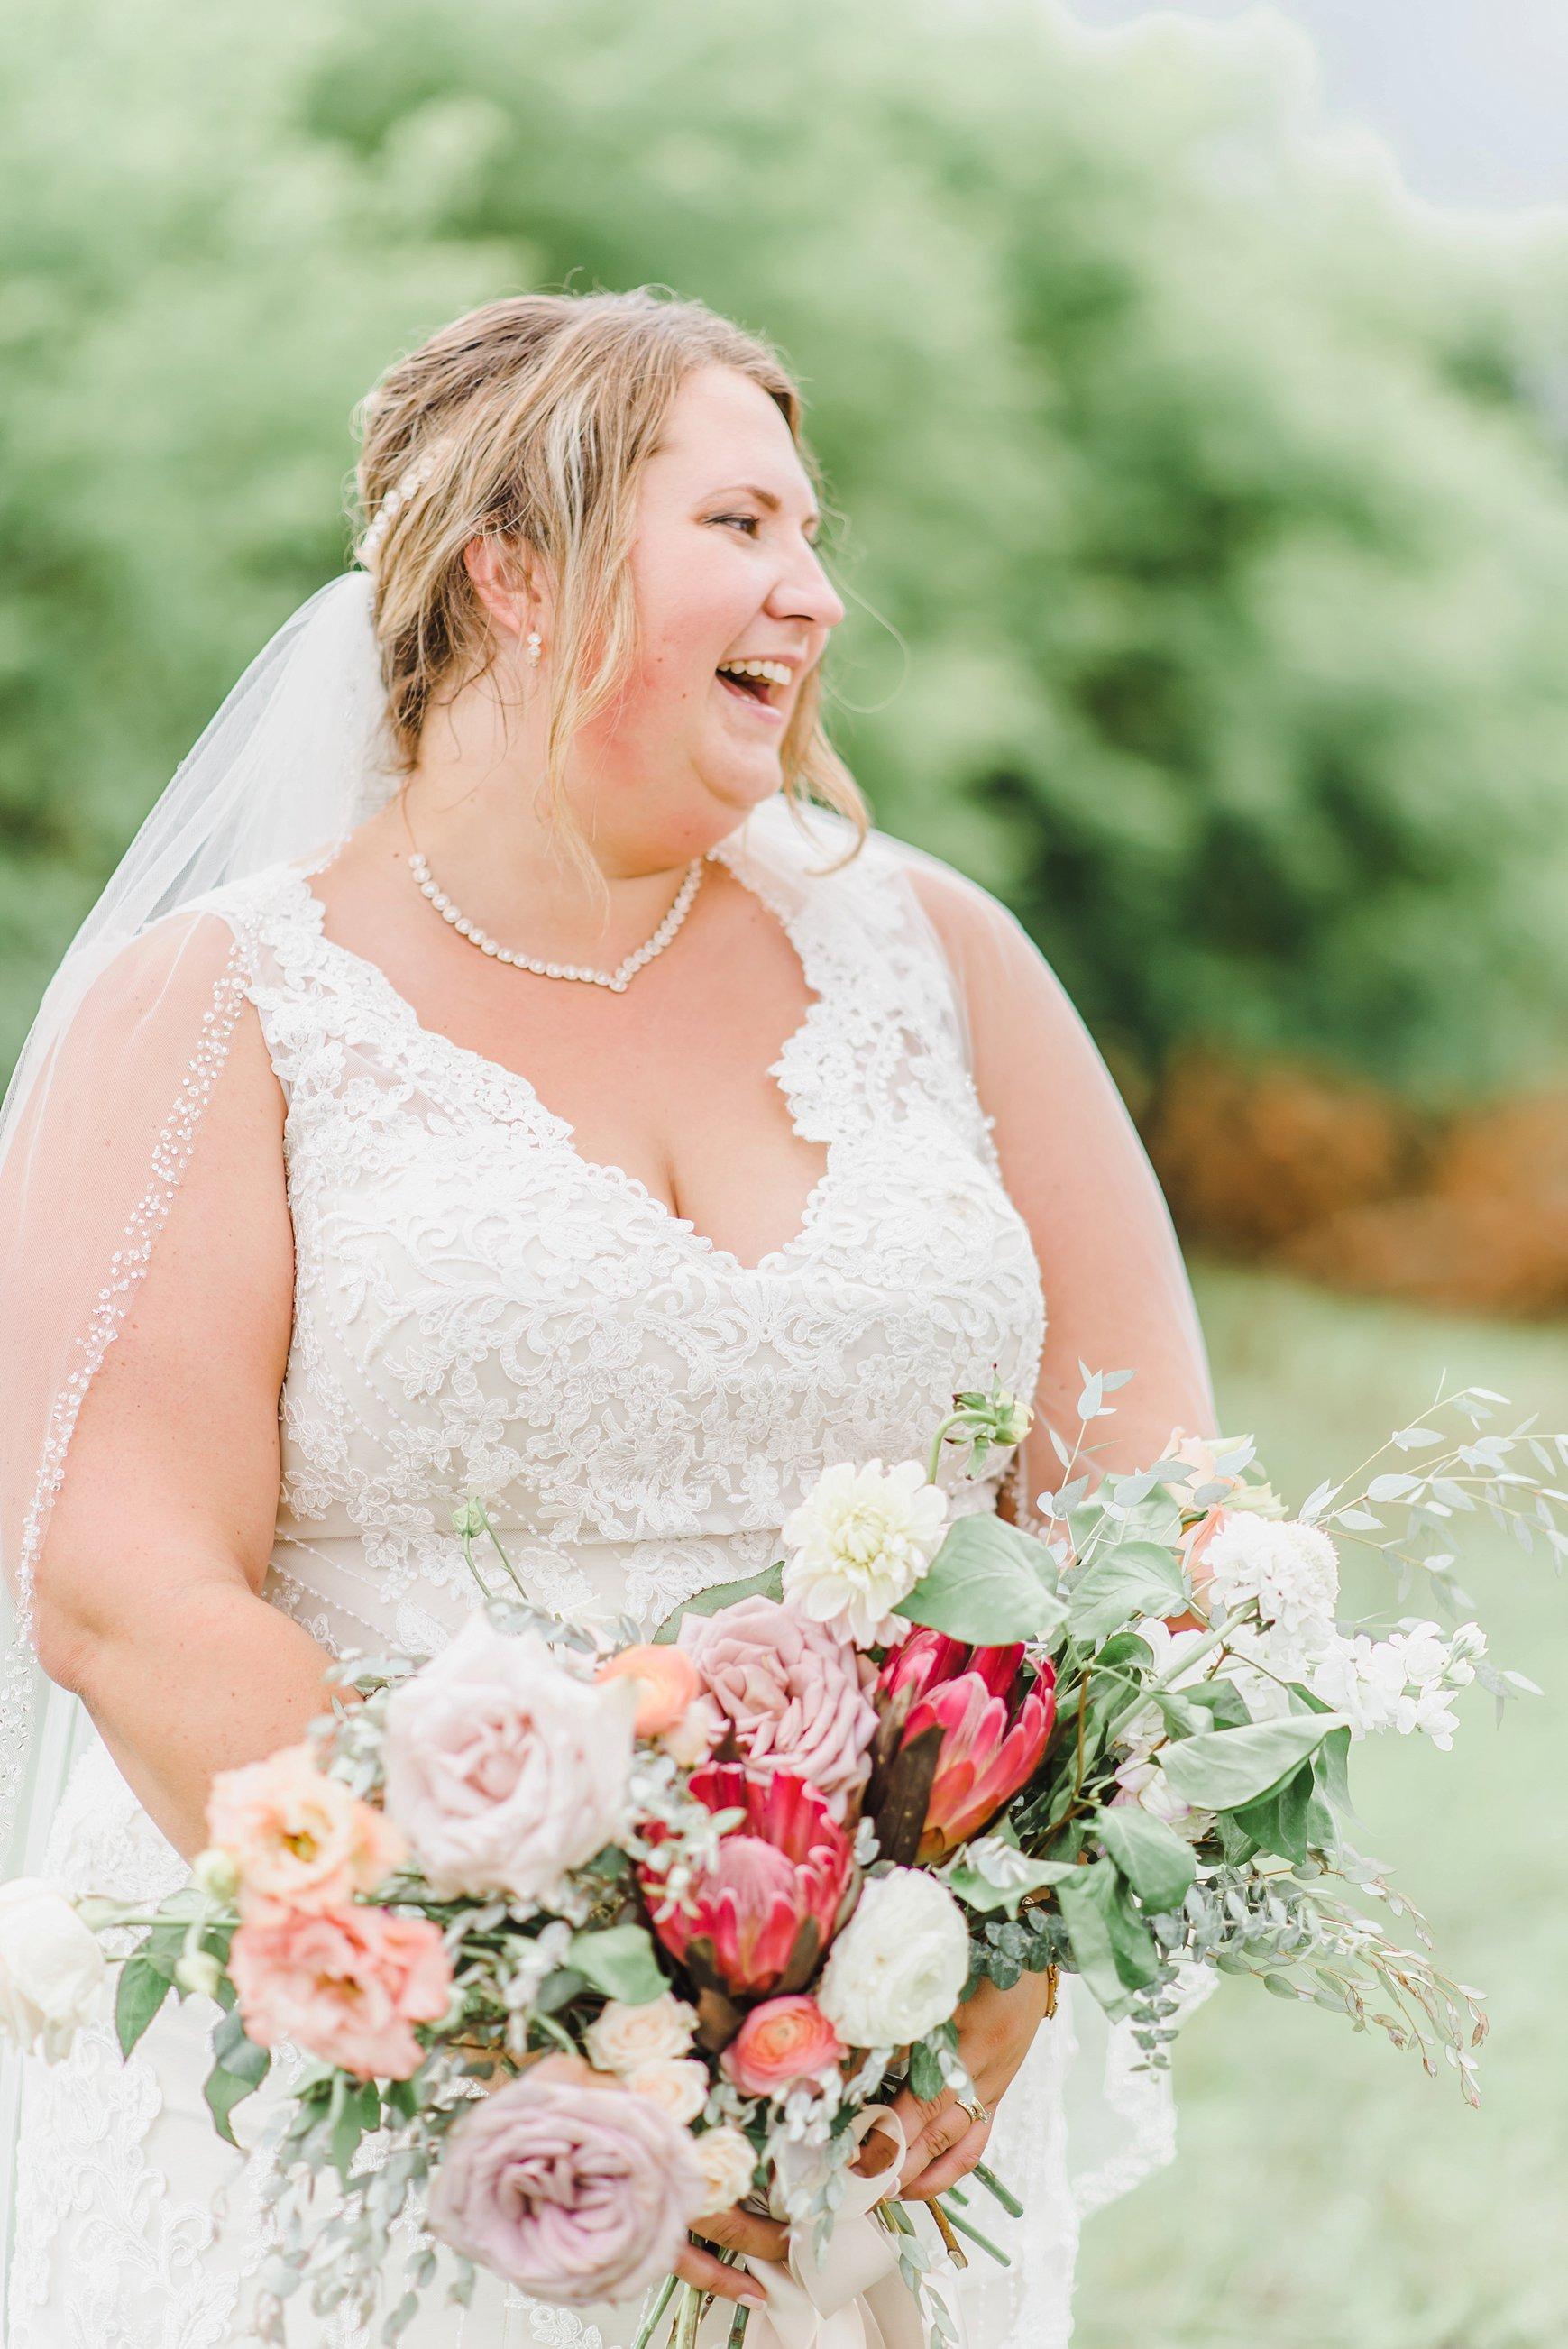 light airy indie fine art ottawa wedding photographer | Ali and Batoul Photography_0419.jpg